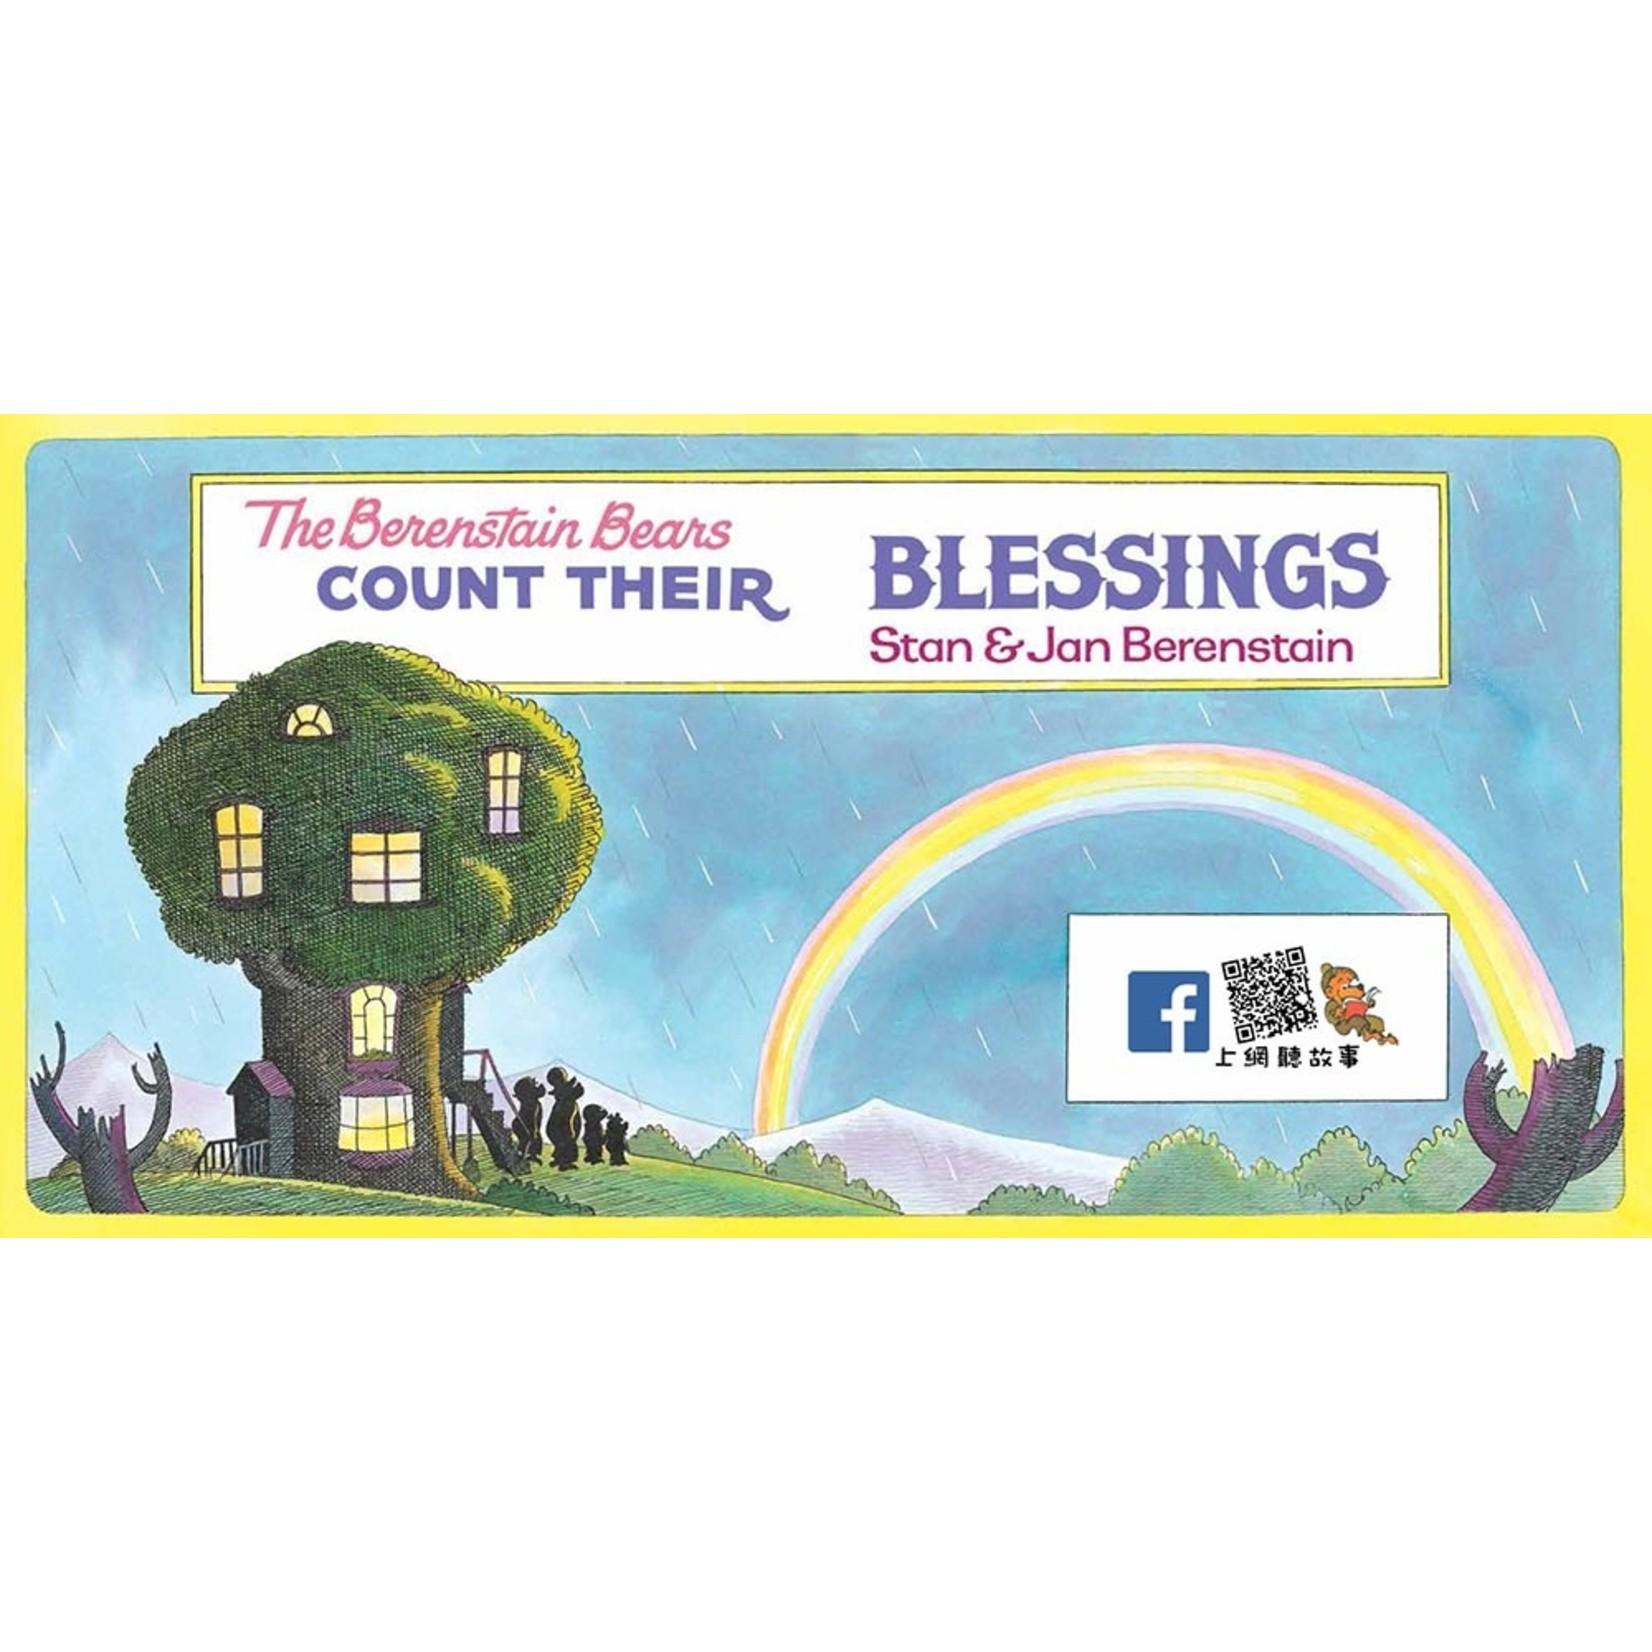 生命樹 Life Tree Global 貝安斯坦熊系列10:數算恩典 The Berenstain Bears 10: Count Their Blessings